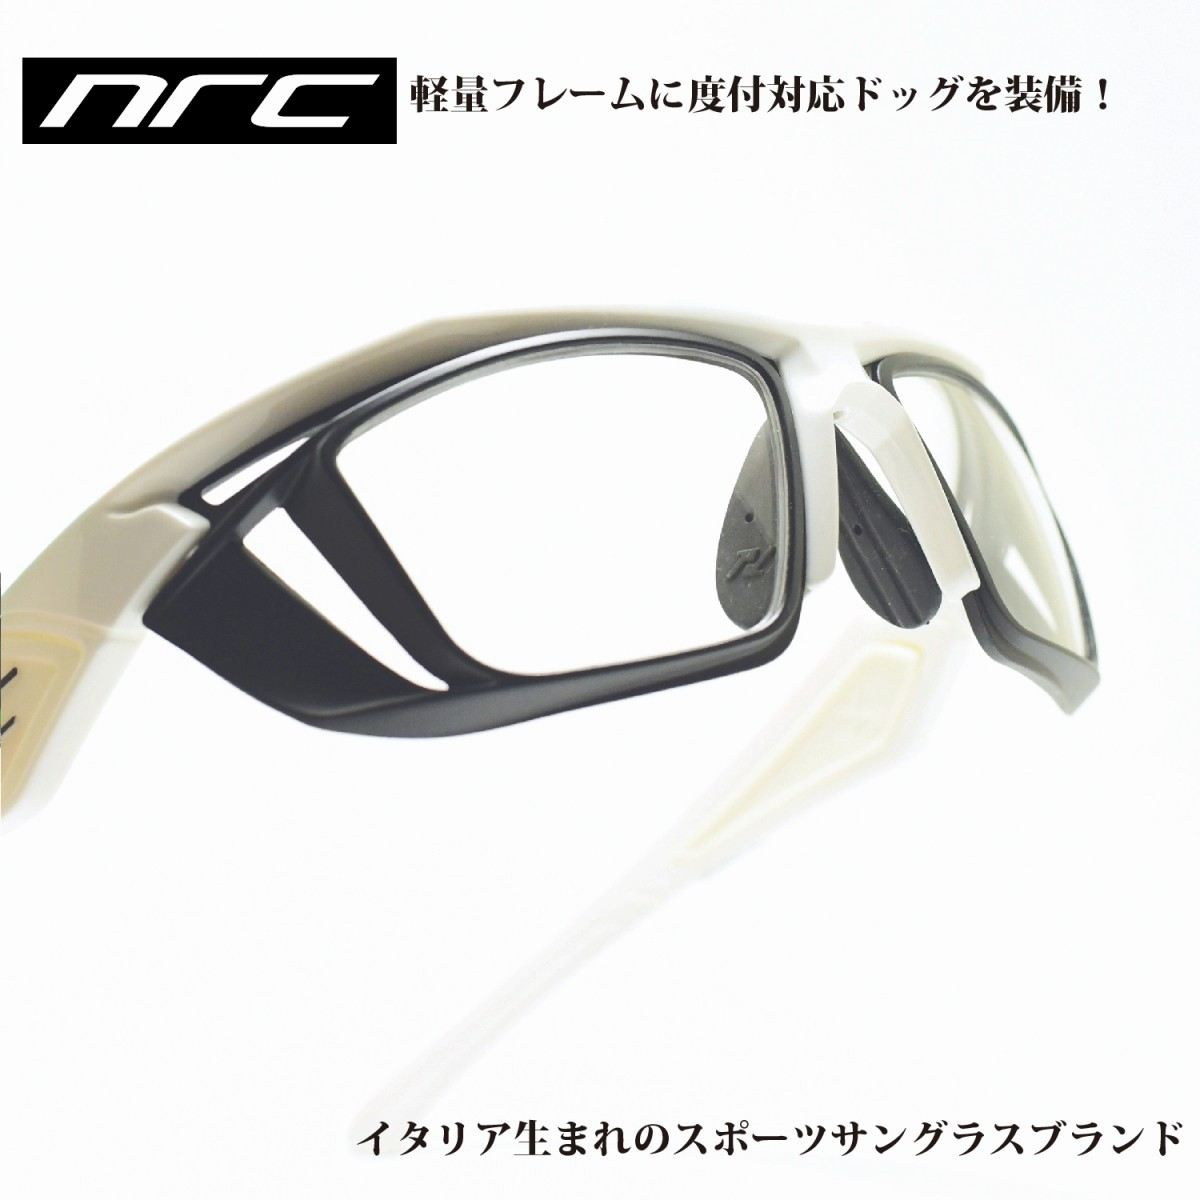 nrc エヌアールシー X5 DOCSTELVIO/OPTICAL DOCメガネ 眼鏡 めがね メンズ レディース おしゃれ ブランド人気 おすすめ フレーム 流行り 度付き レンズ サングラス